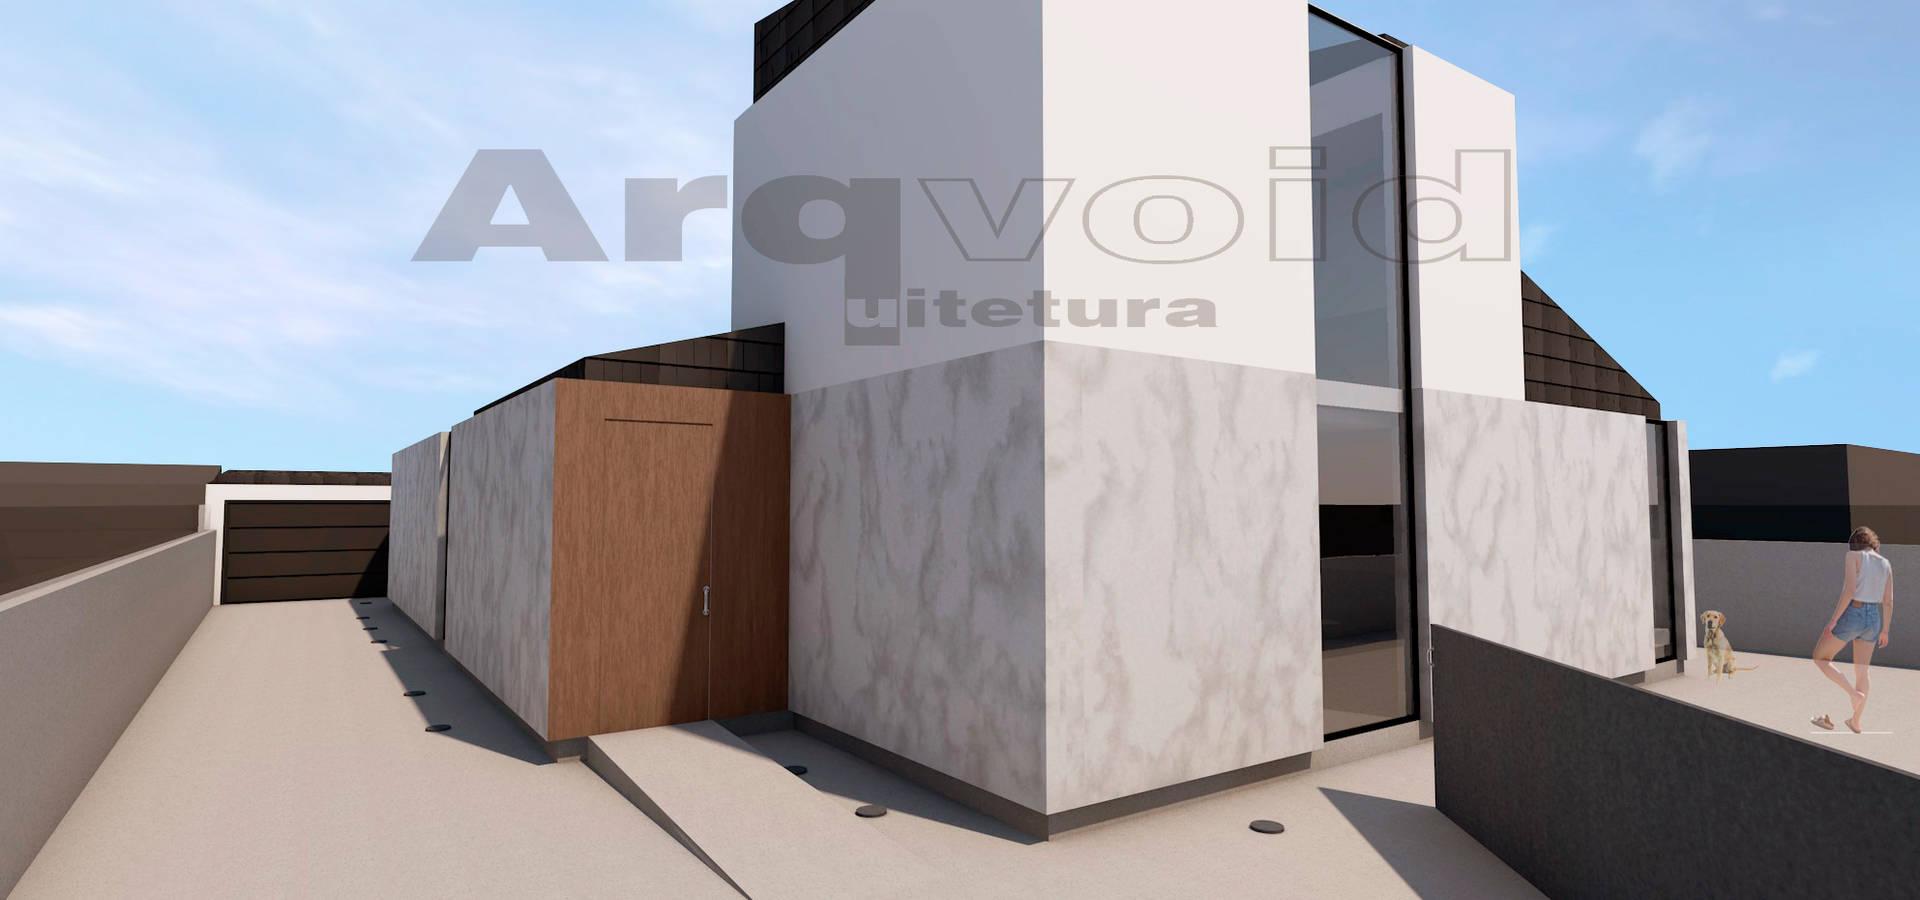 Arqvoid – Arquitetura e Serviços, Lda.